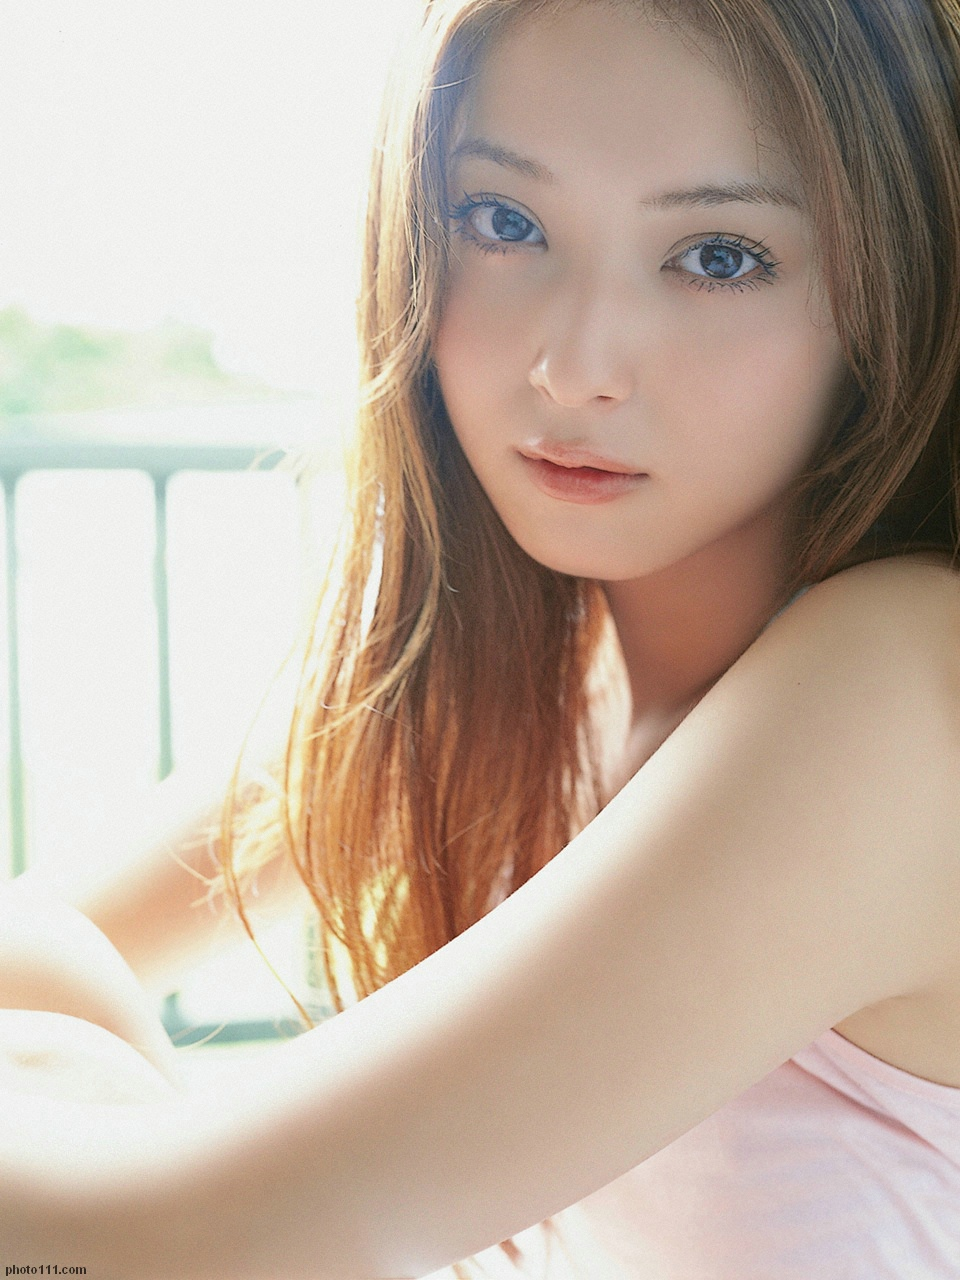 nozomi sasaki japanesex foto gallery